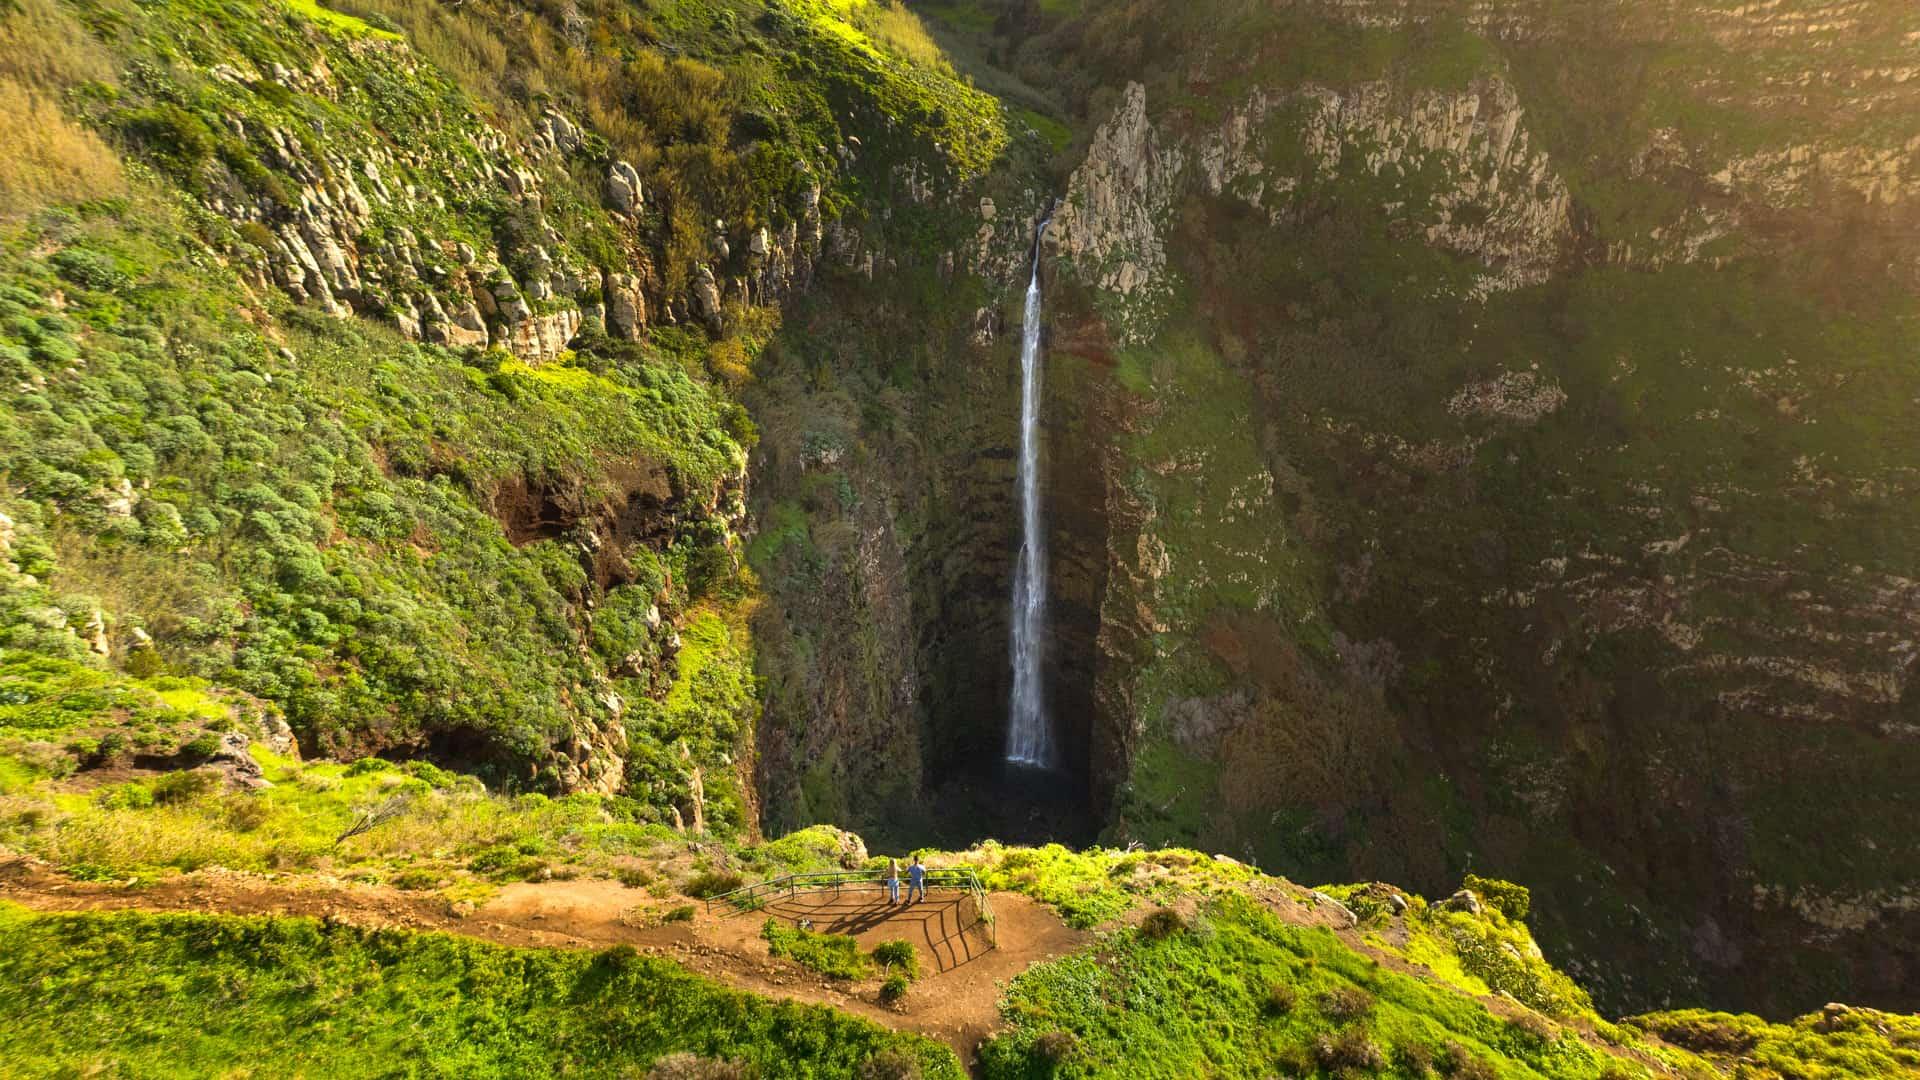 garganta-funda-waterfall-madeira